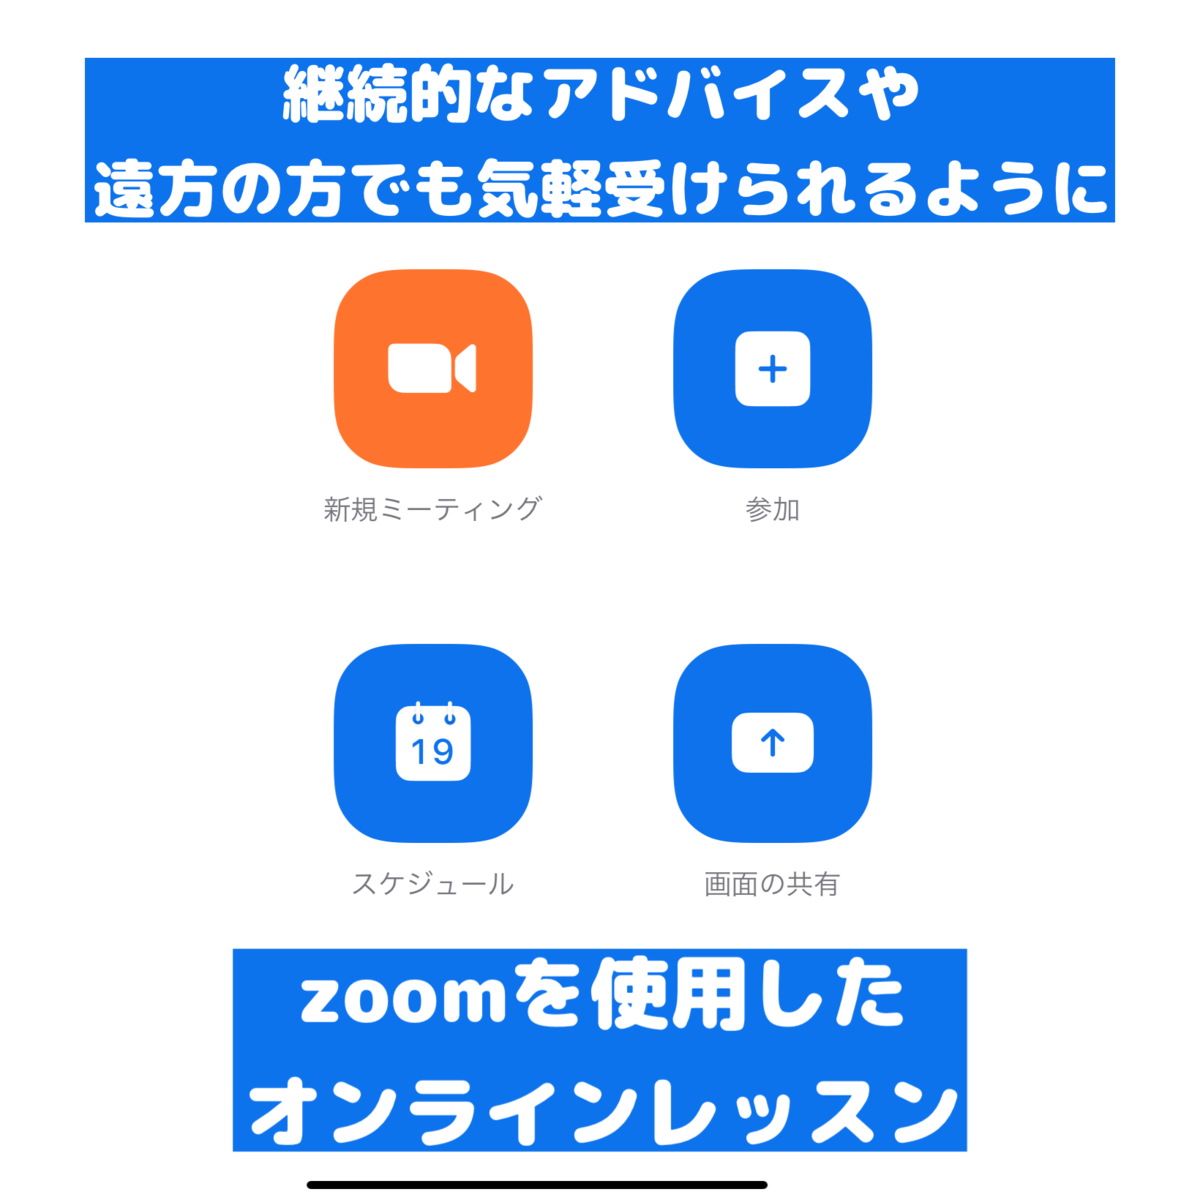 f:id:zomzom-rider:20210218220148p:plain